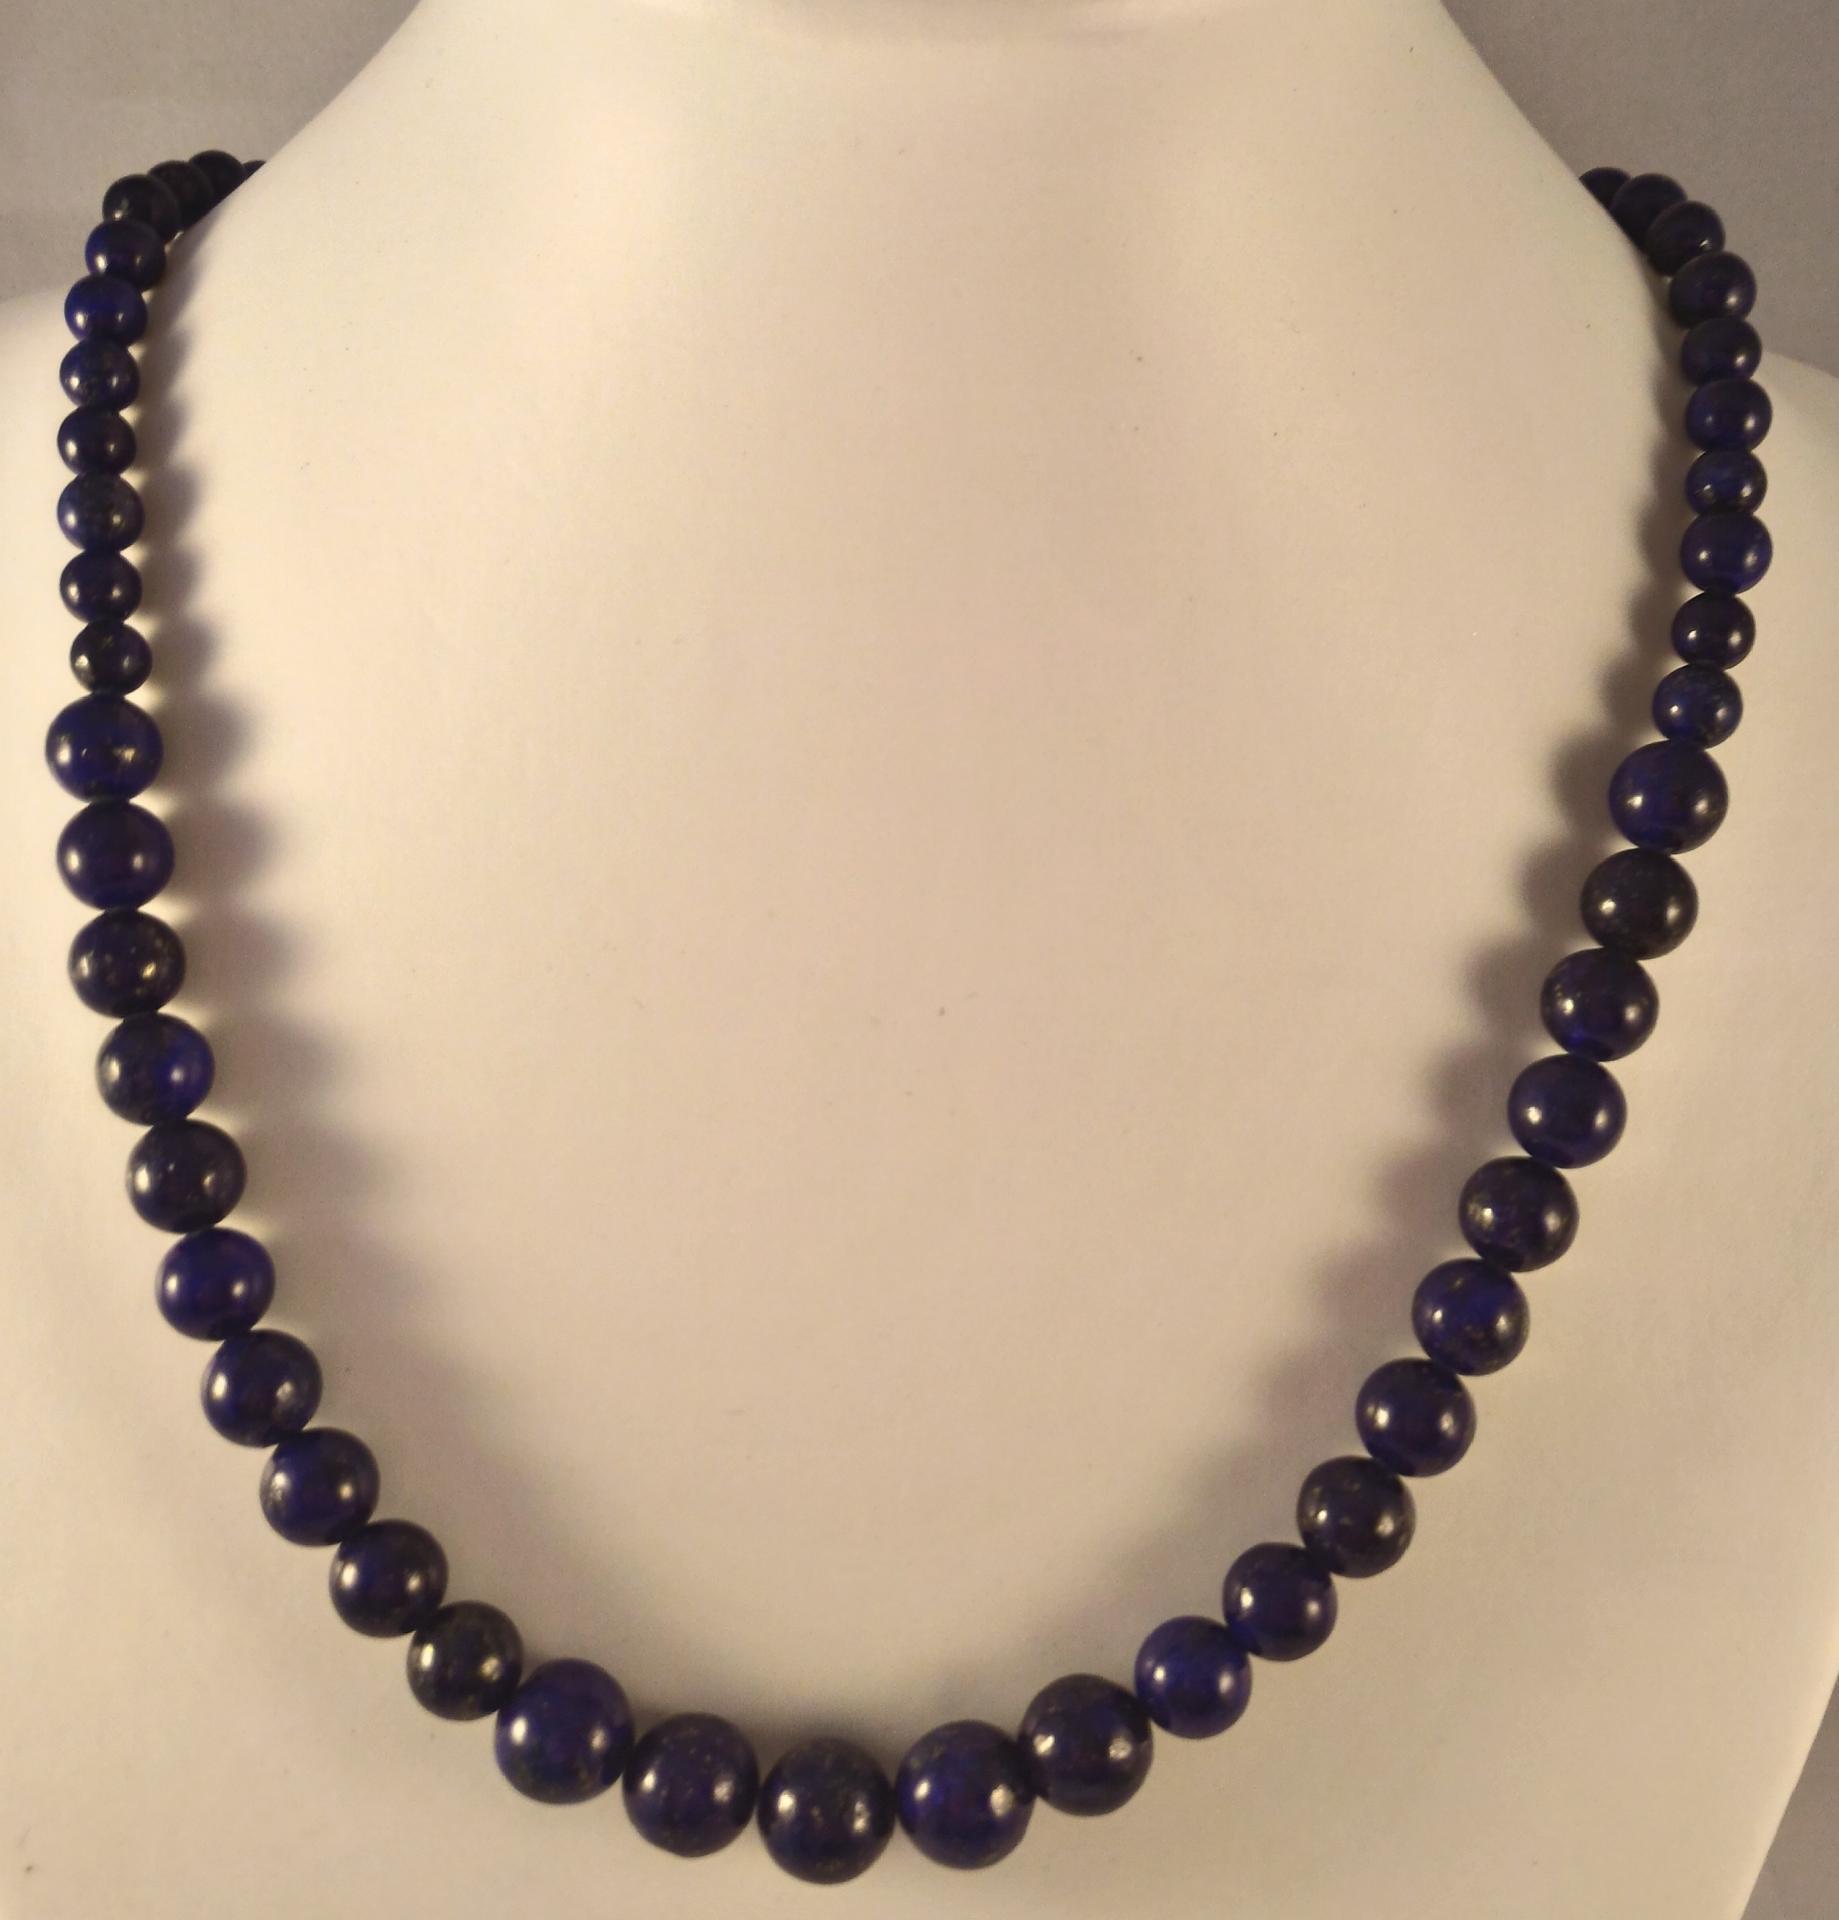 0201 collier lapis lazuli 2